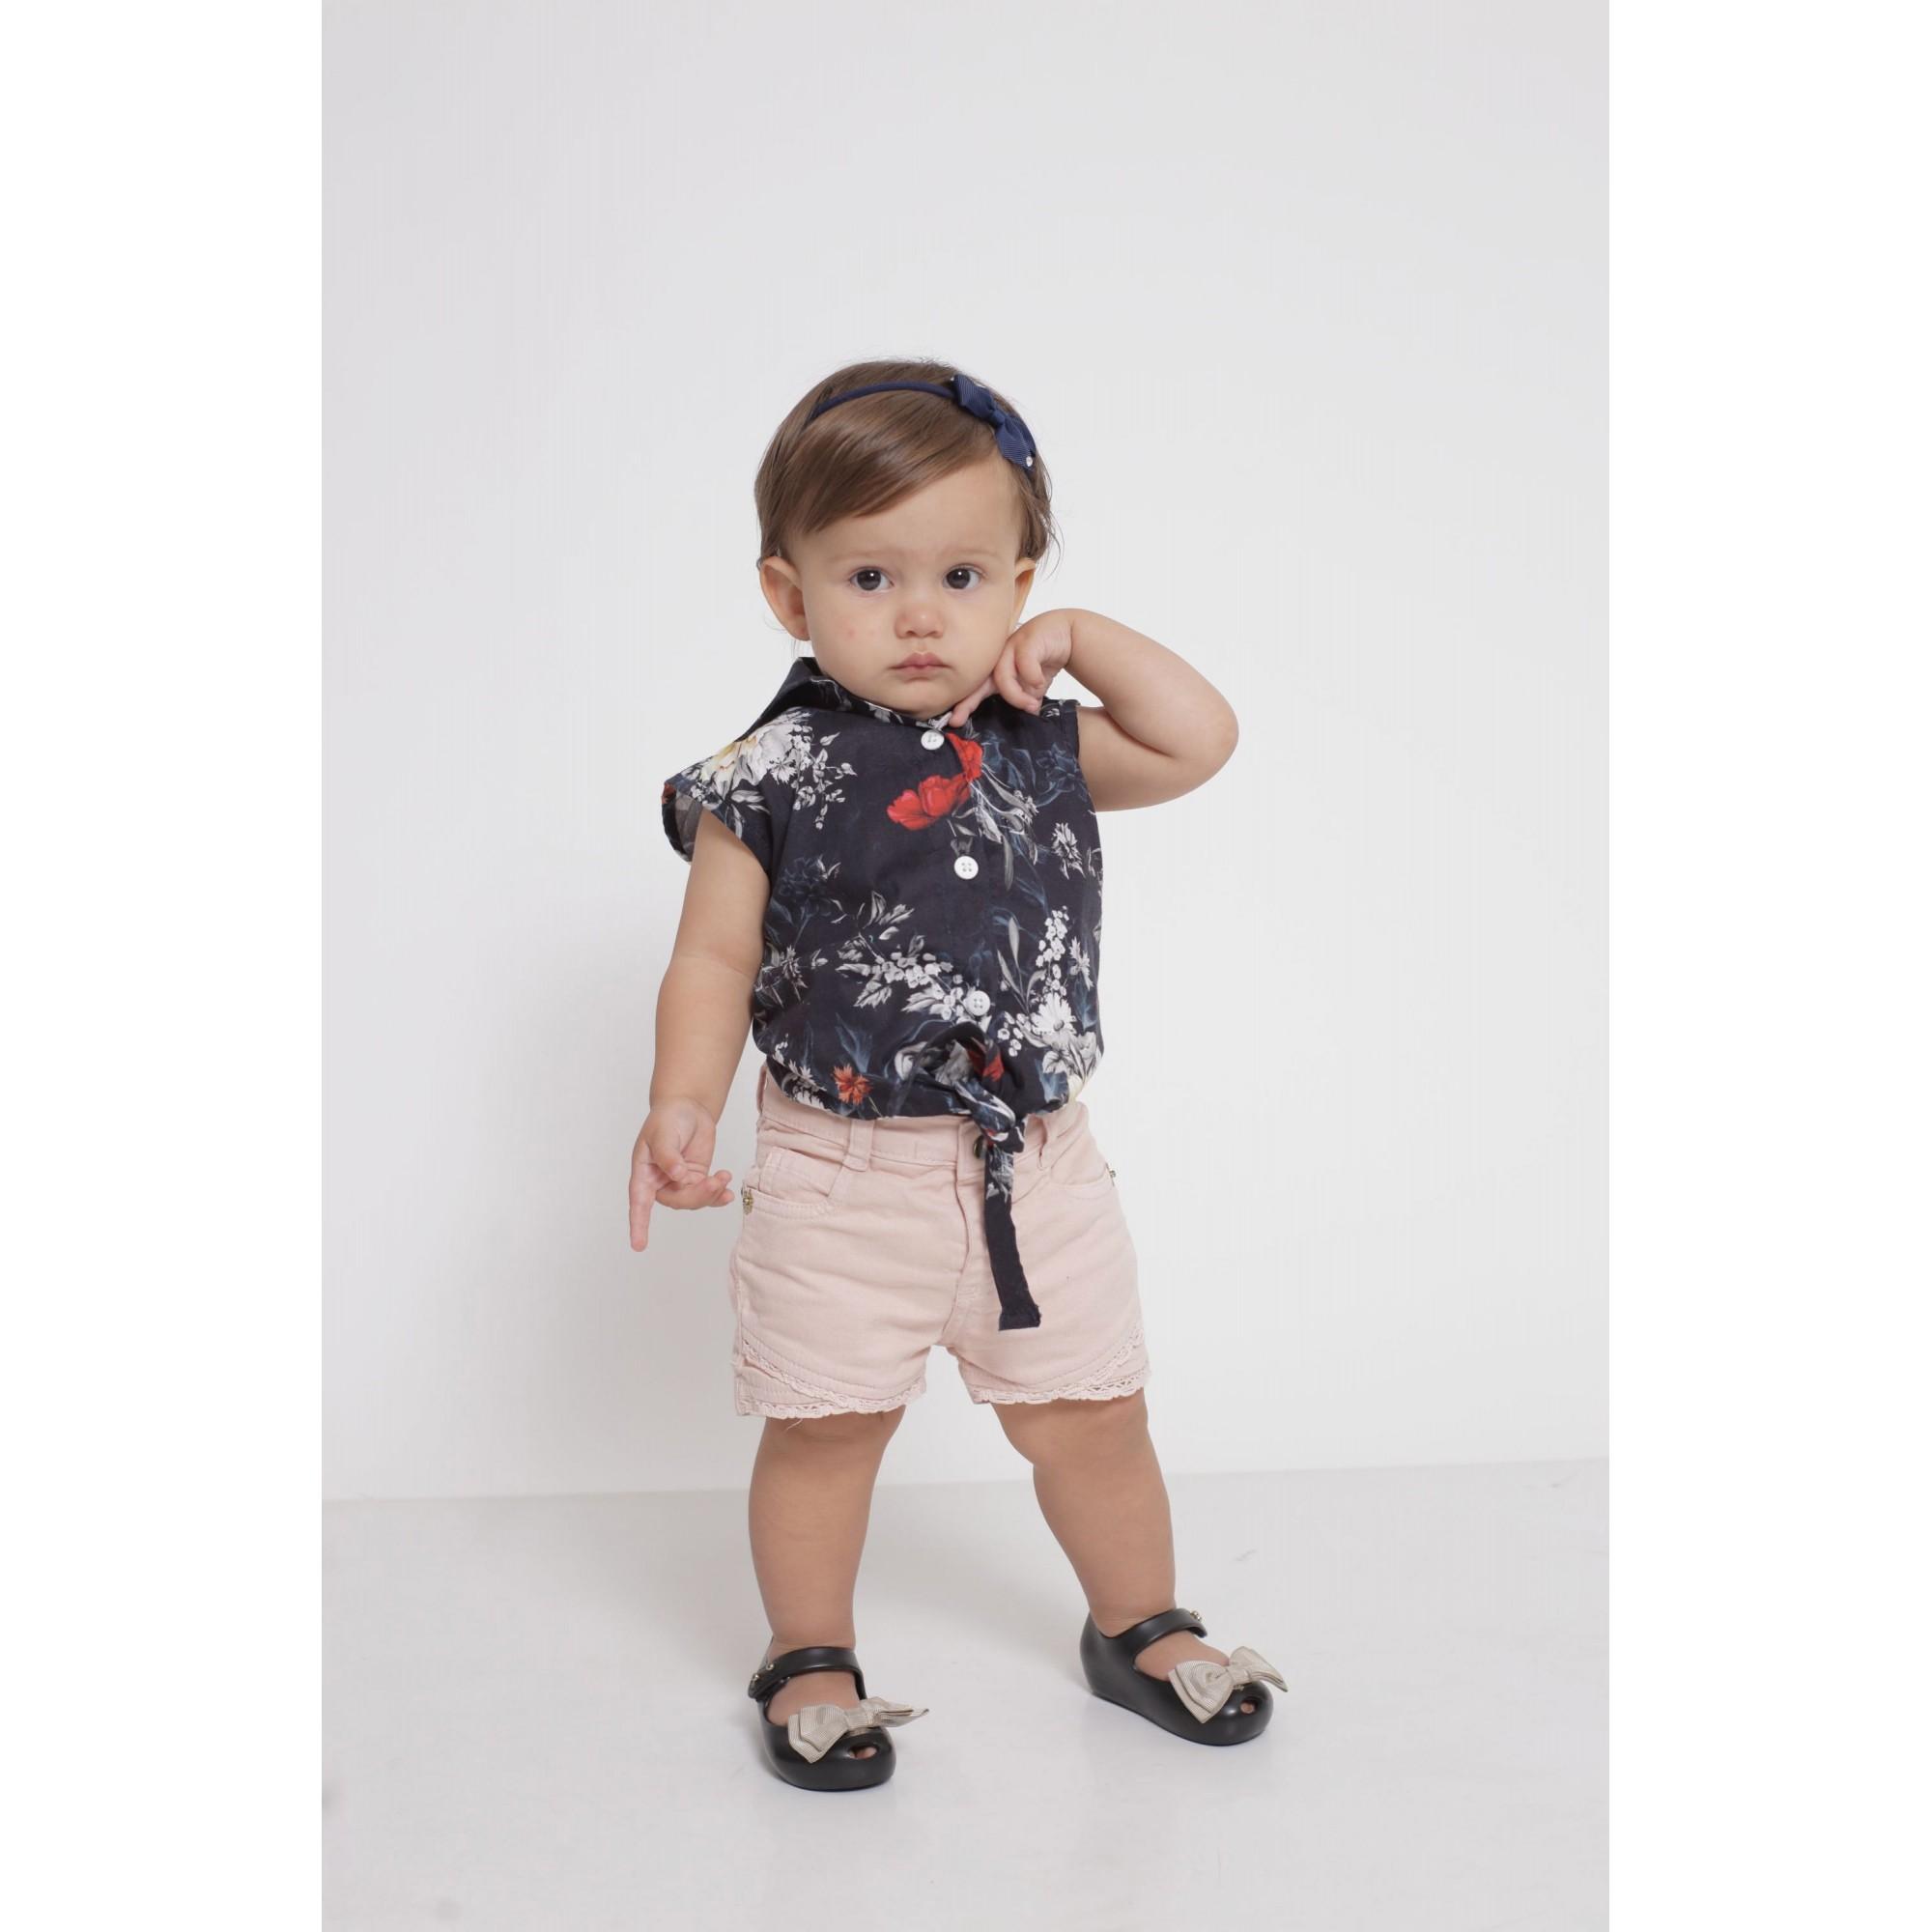 Camisa Social Sem Manga Preta Floral Feminina Infantil  - Heitor Fashion Brazil